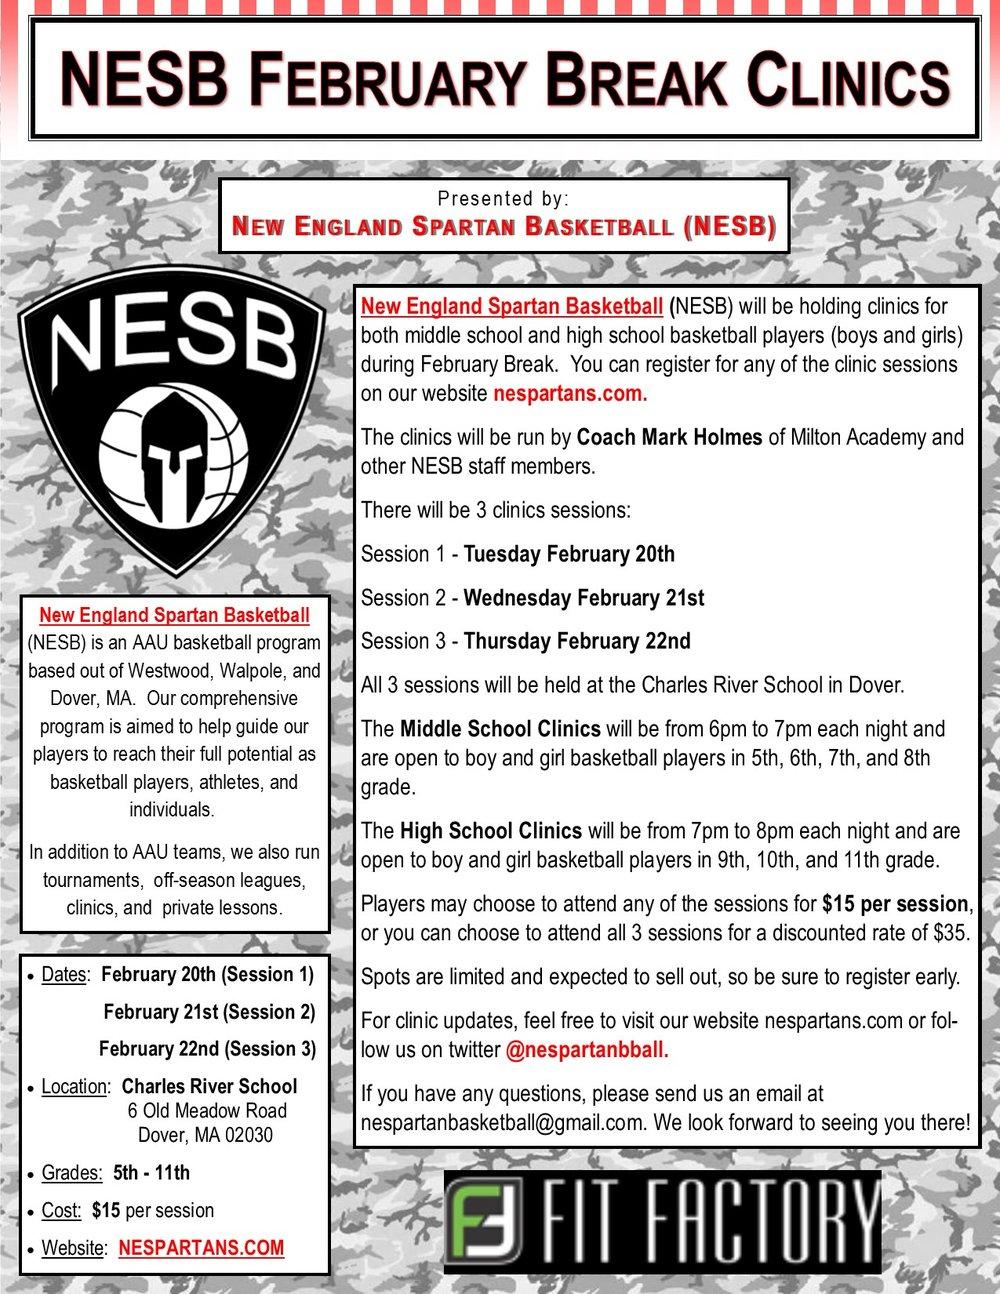 NESB February Clinics 2018.jpg